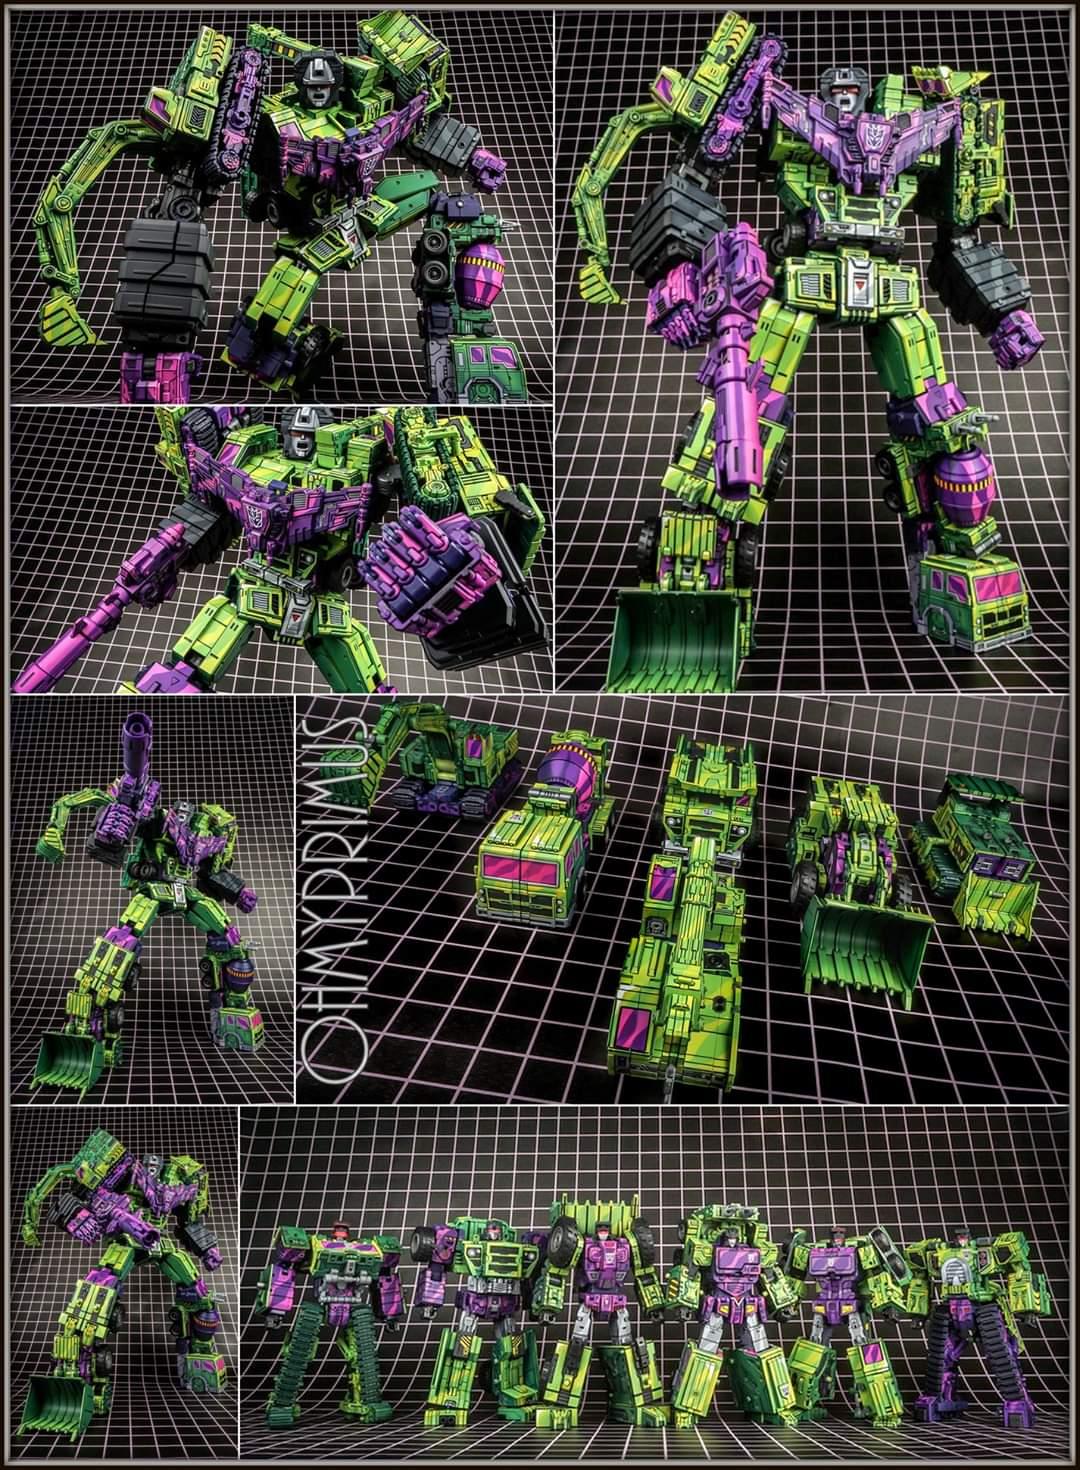 [Toyworld] Produit Tiers - Jouet TW-C Constructor aka Devastator/Dévastateur (Version vert G1 et jaune G2) - Page 11 Uroisv8c_o